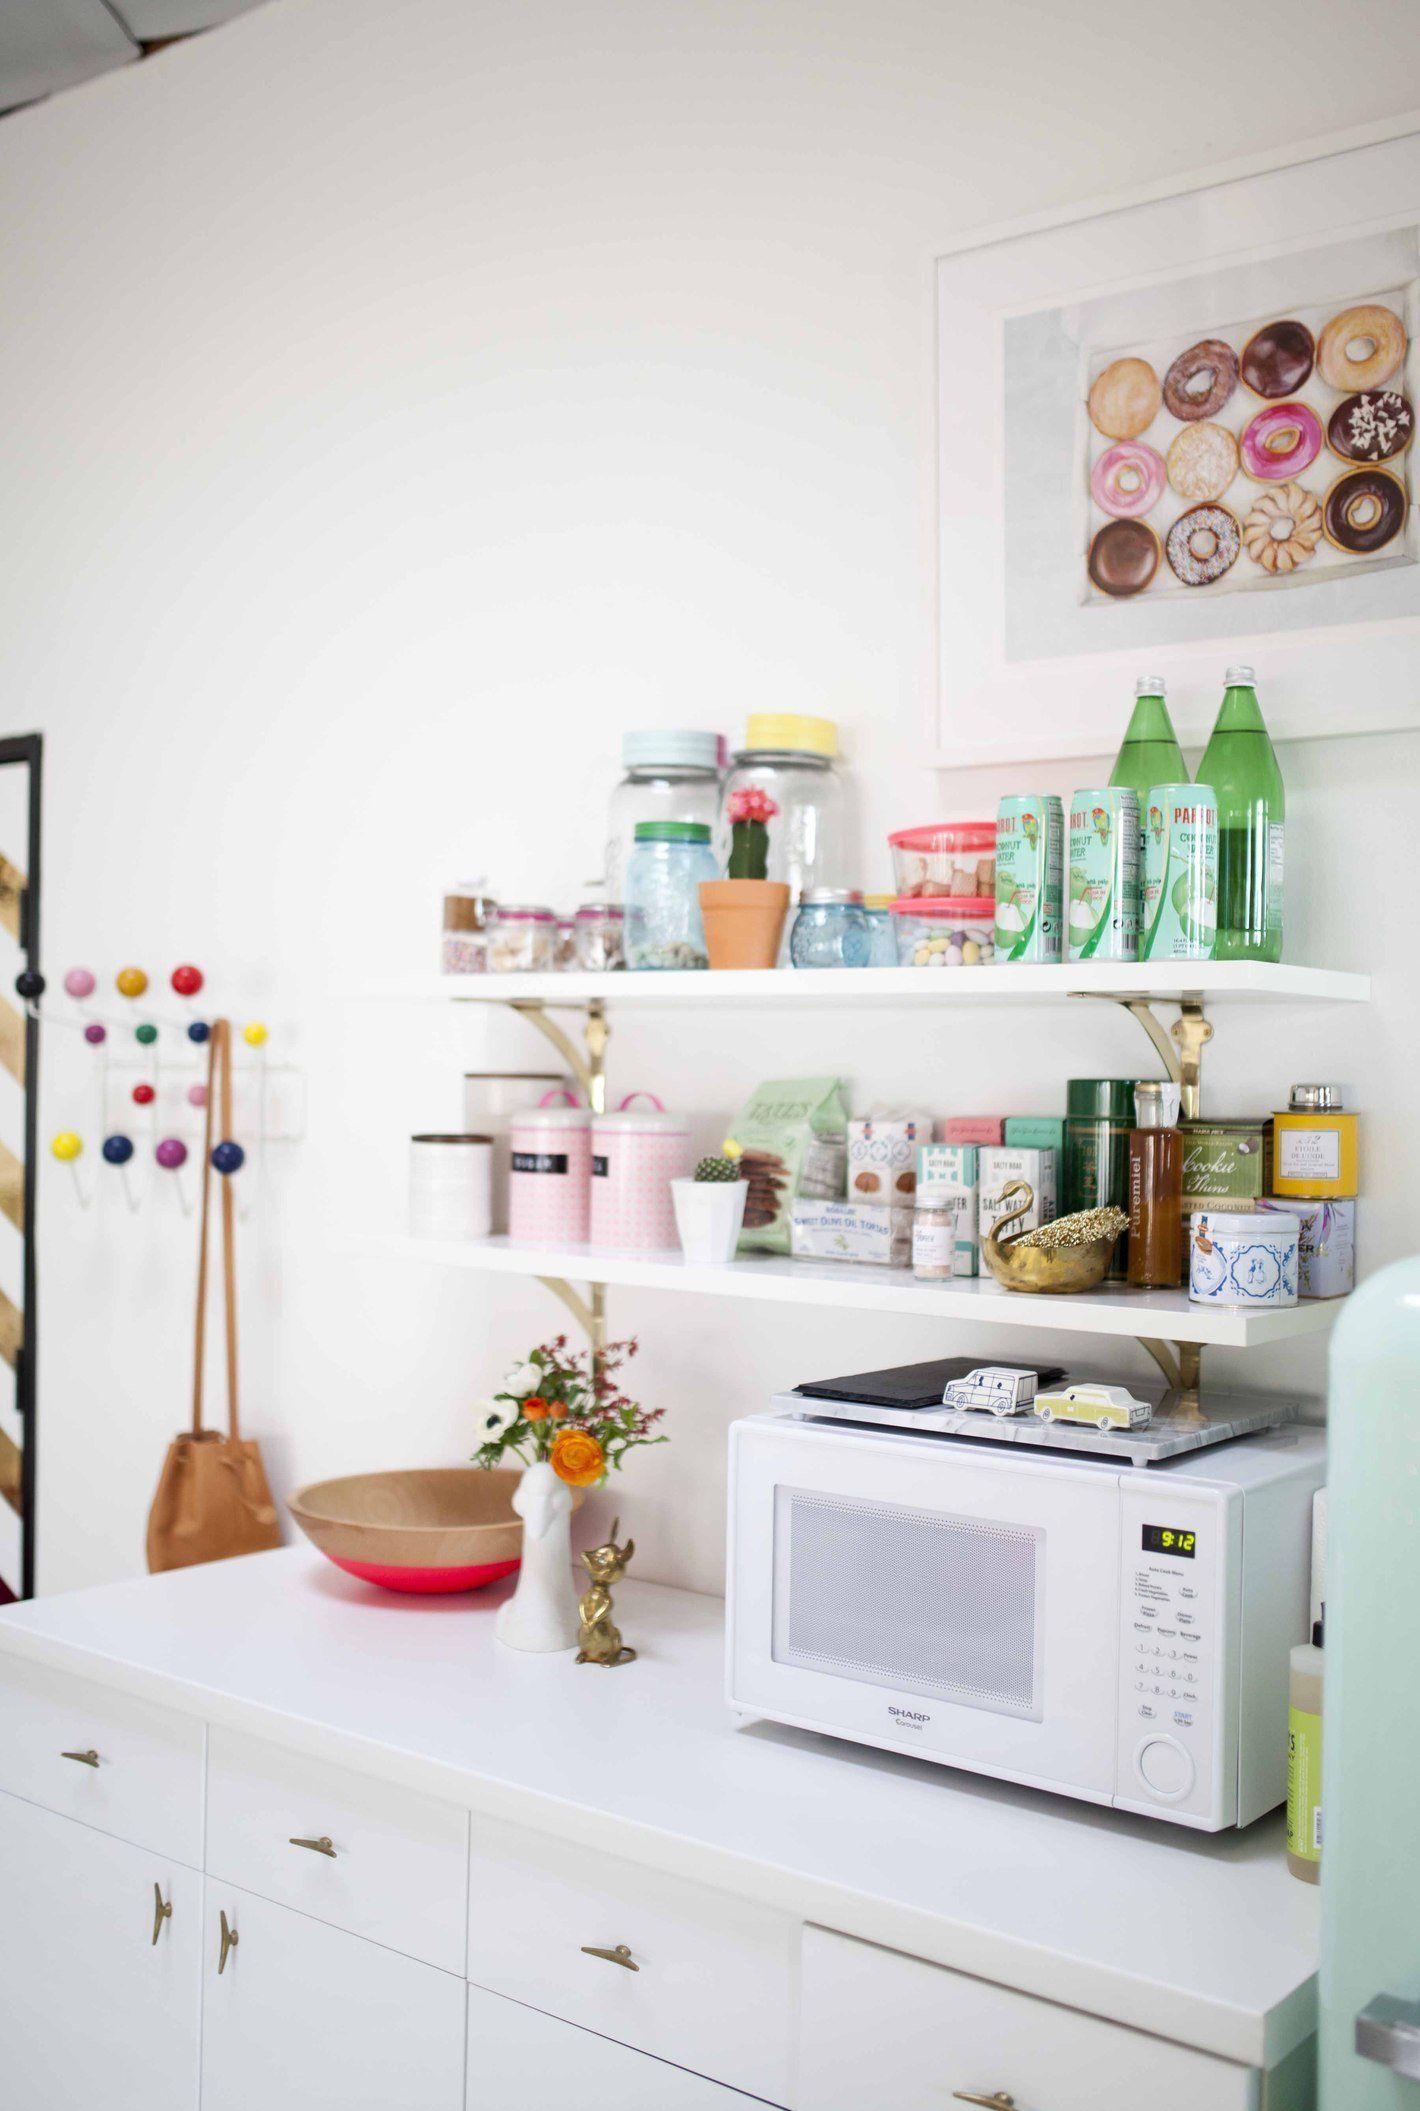 kitchen office organization ideas. 18 Genius Kitchen Organizing Tips From Our Office Organization Ideas 4